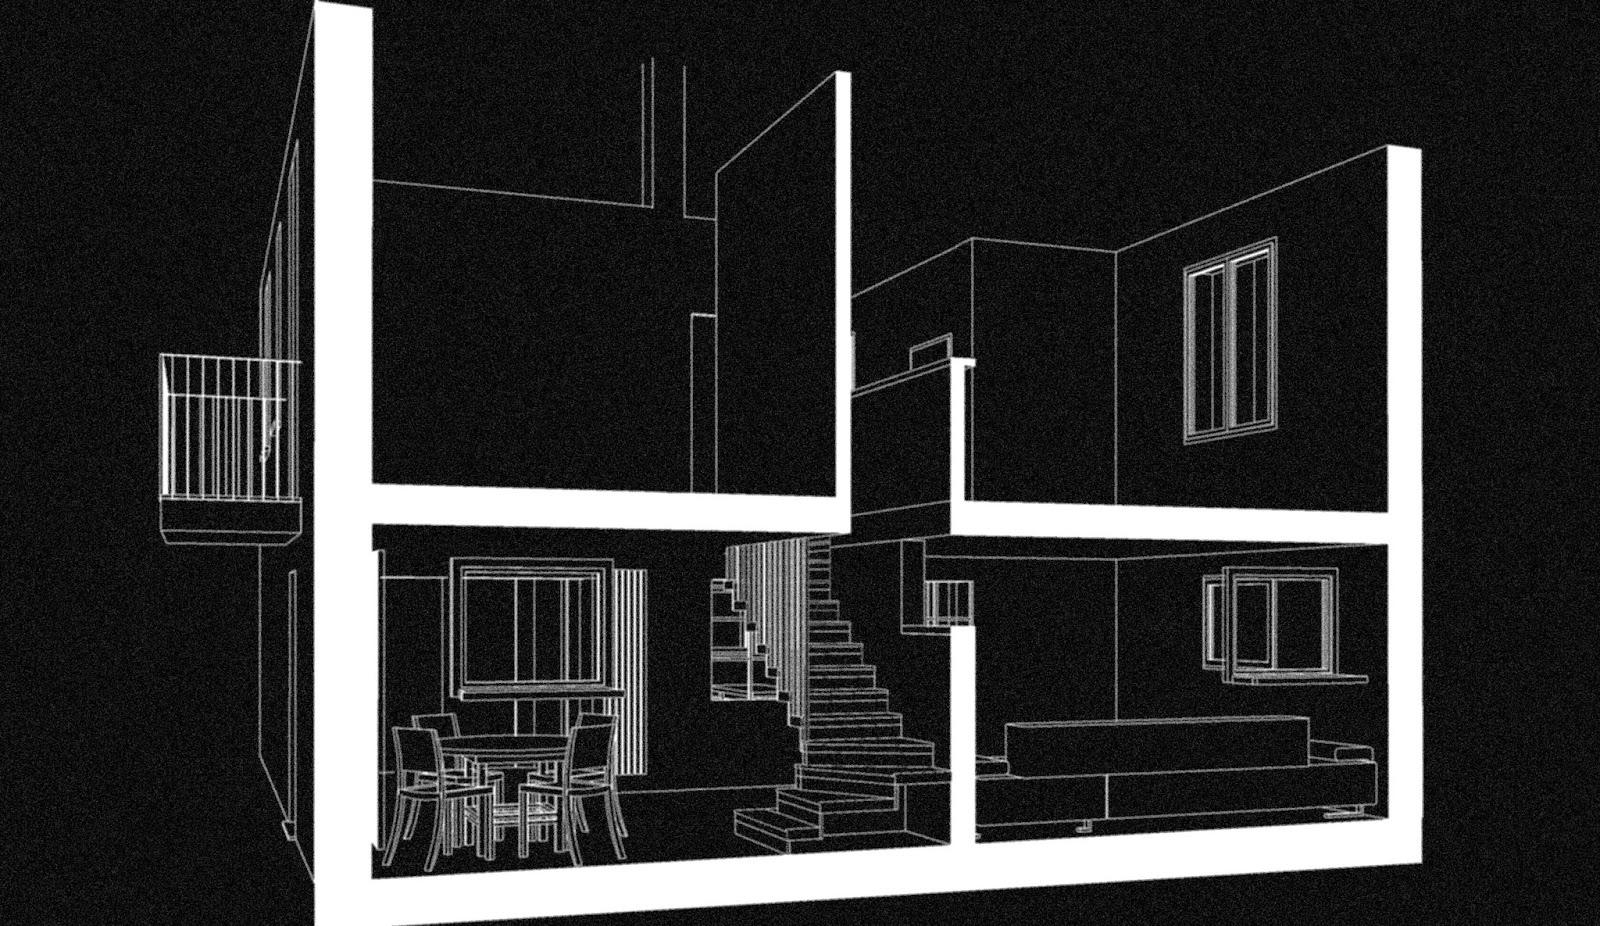 studio architettura assago